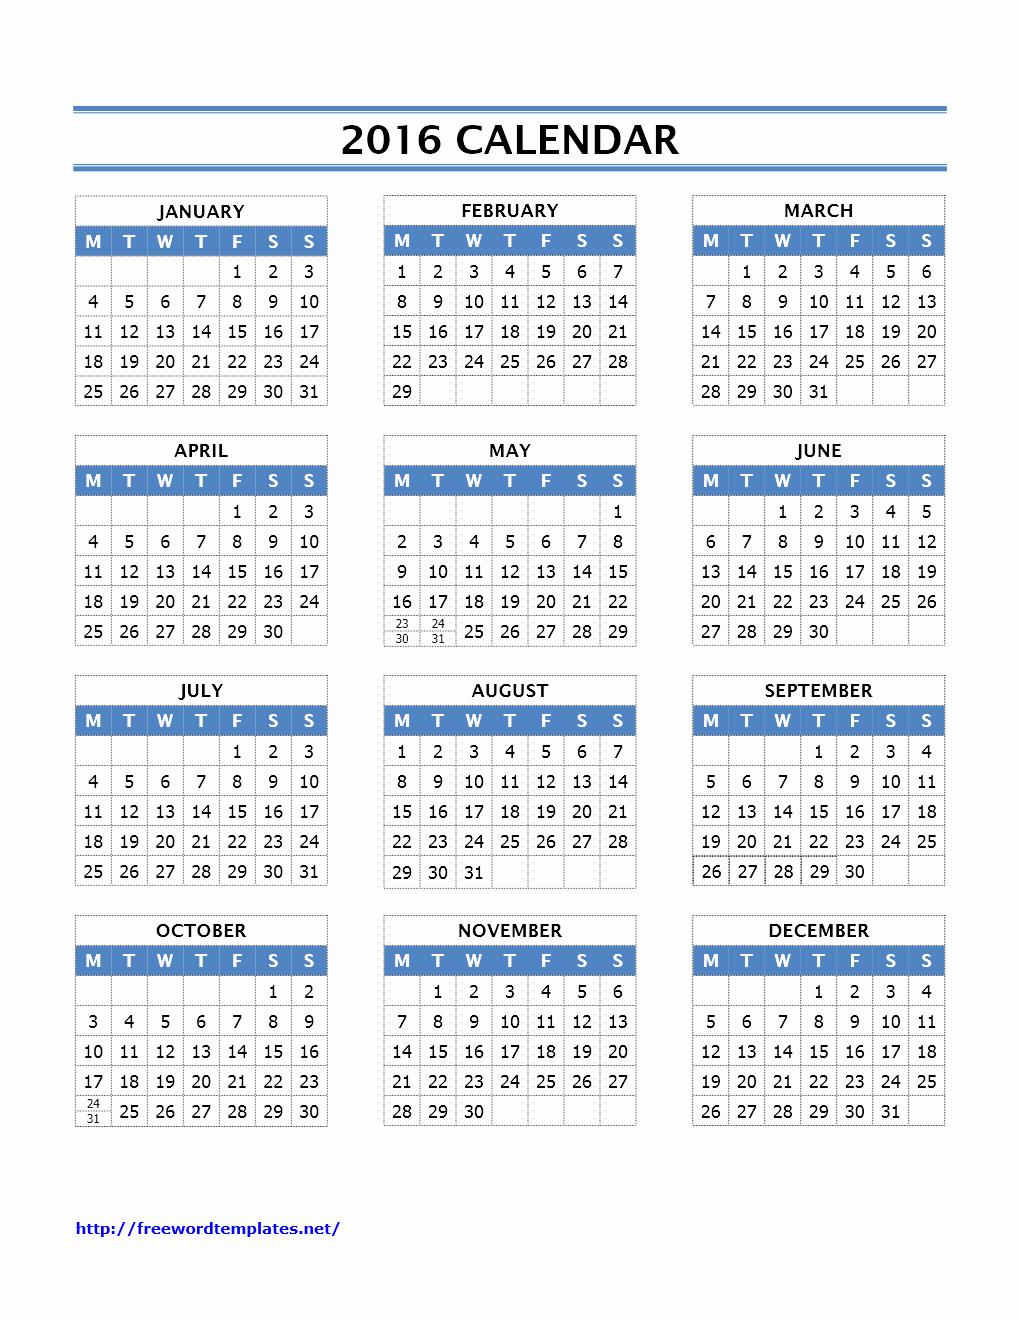 Calendar 2016 Printable with Holidays New 2016 Calendar Templates